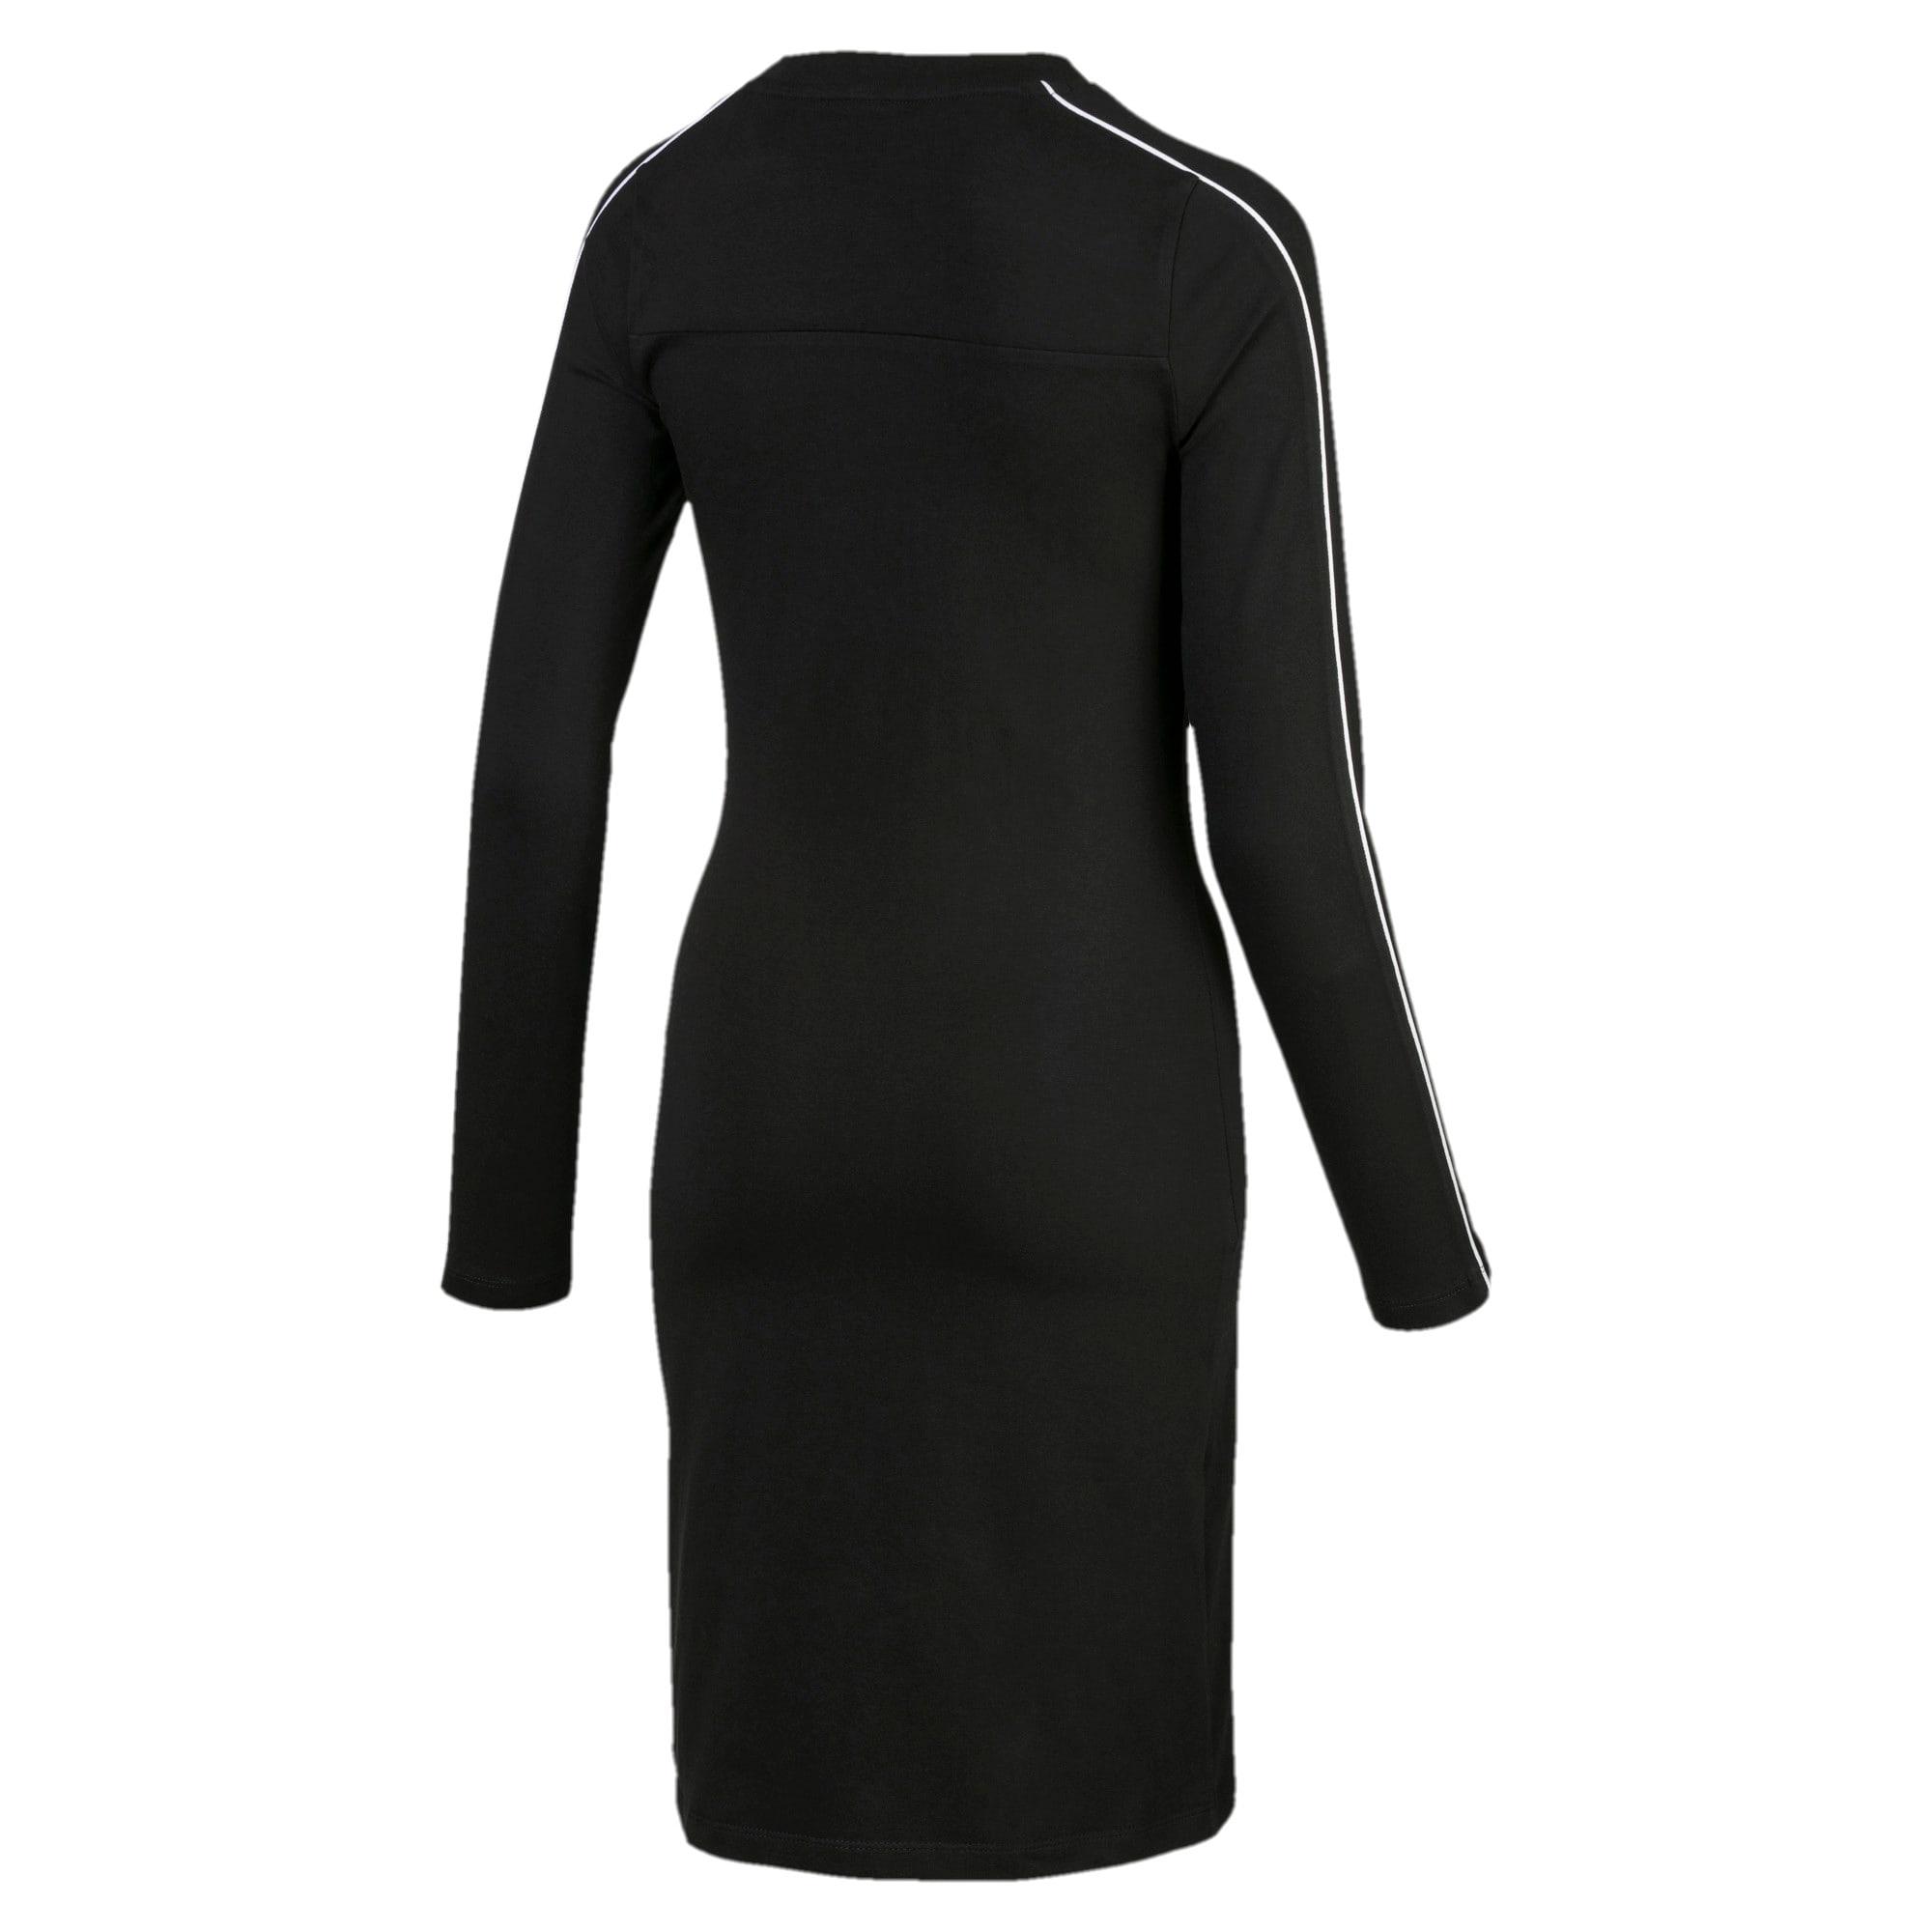 Thumbnail 5 of CLASSICS ウィメンズ ドレス, Cotton Black, medium-JPN